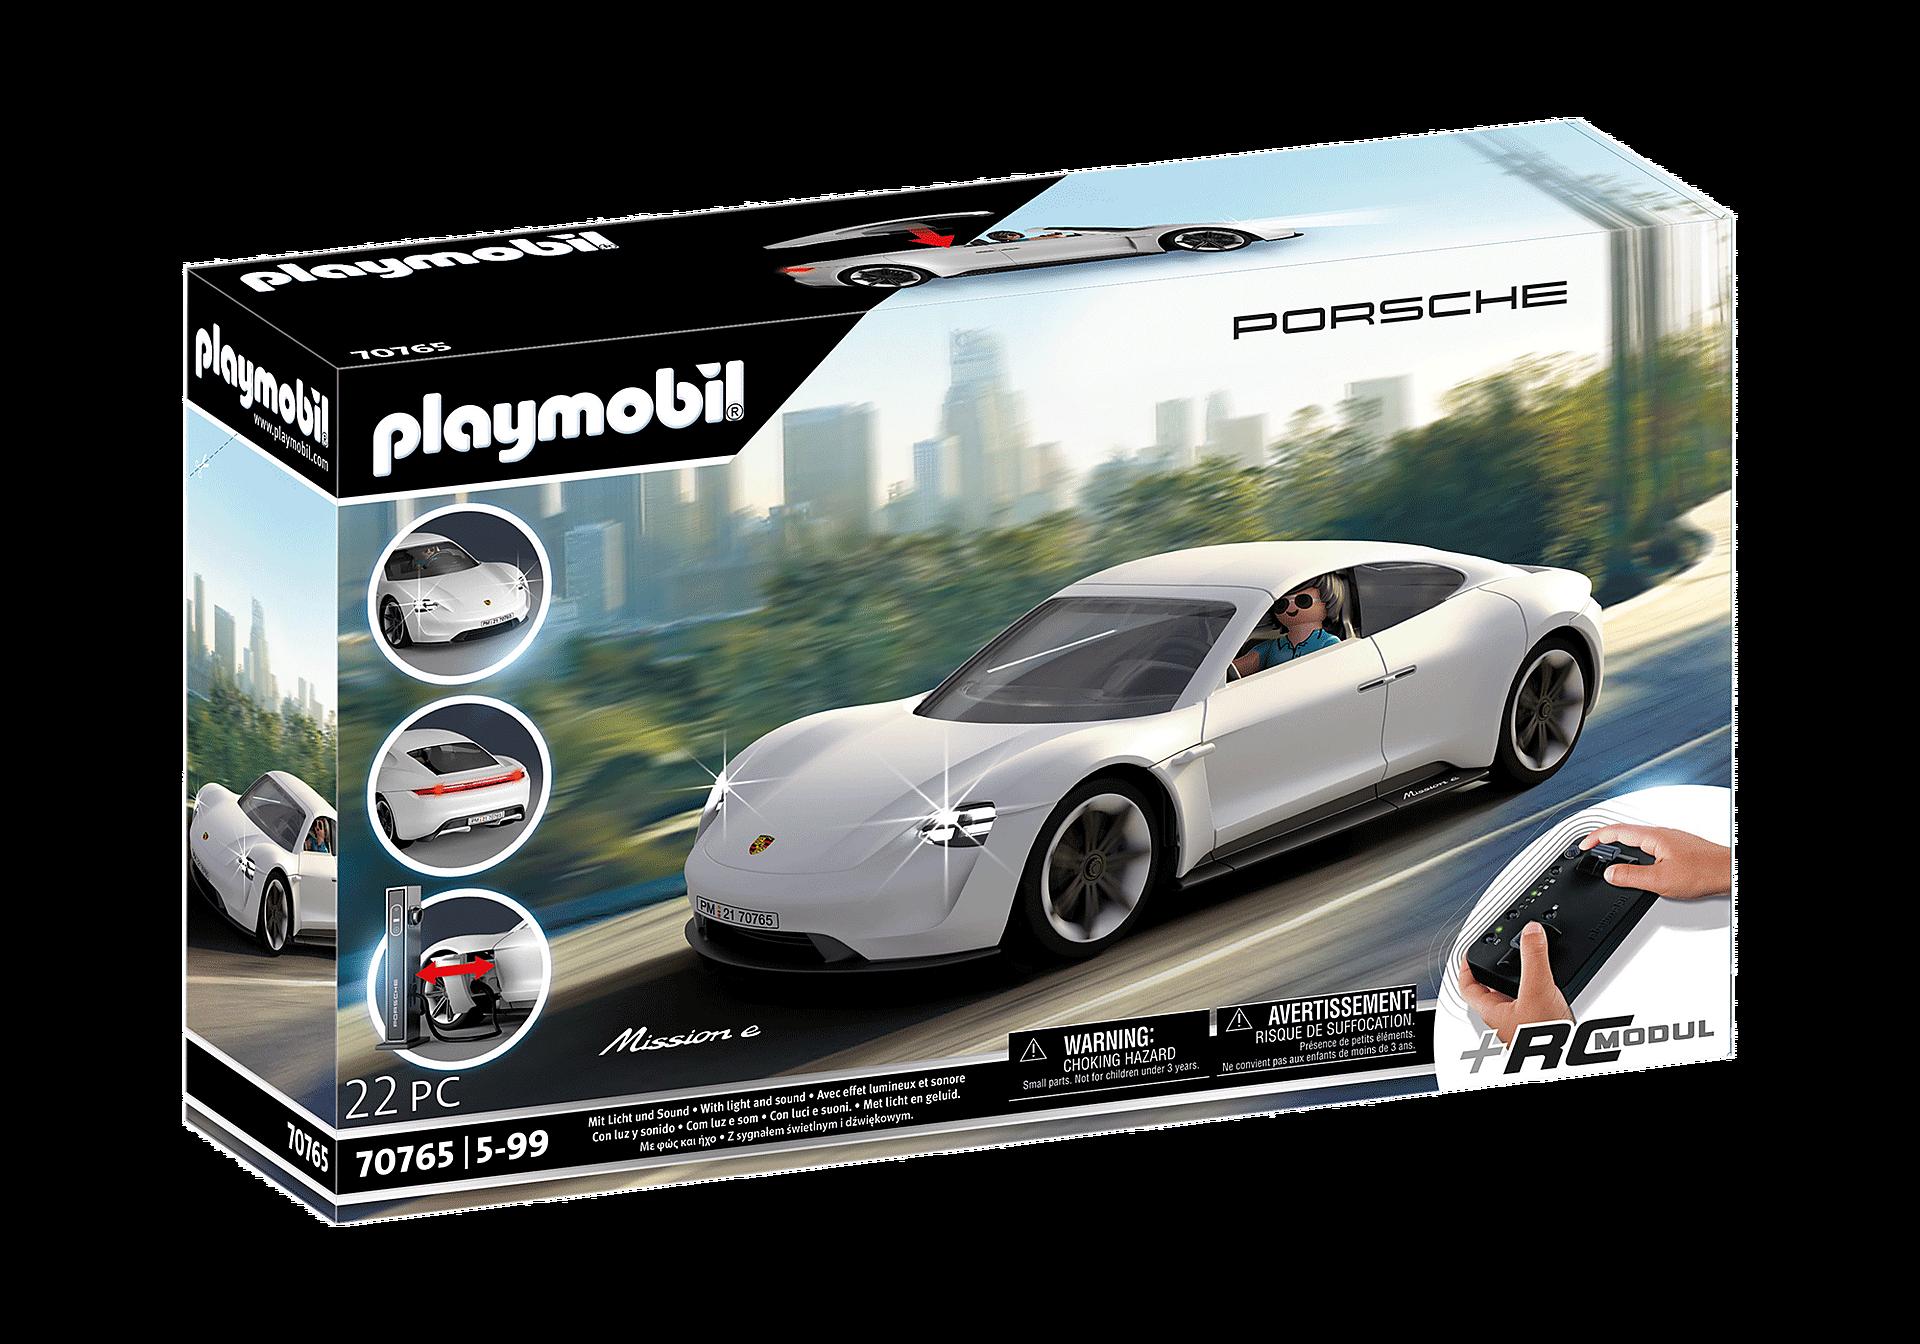 Playmobil - Porsche Mission E (70765)